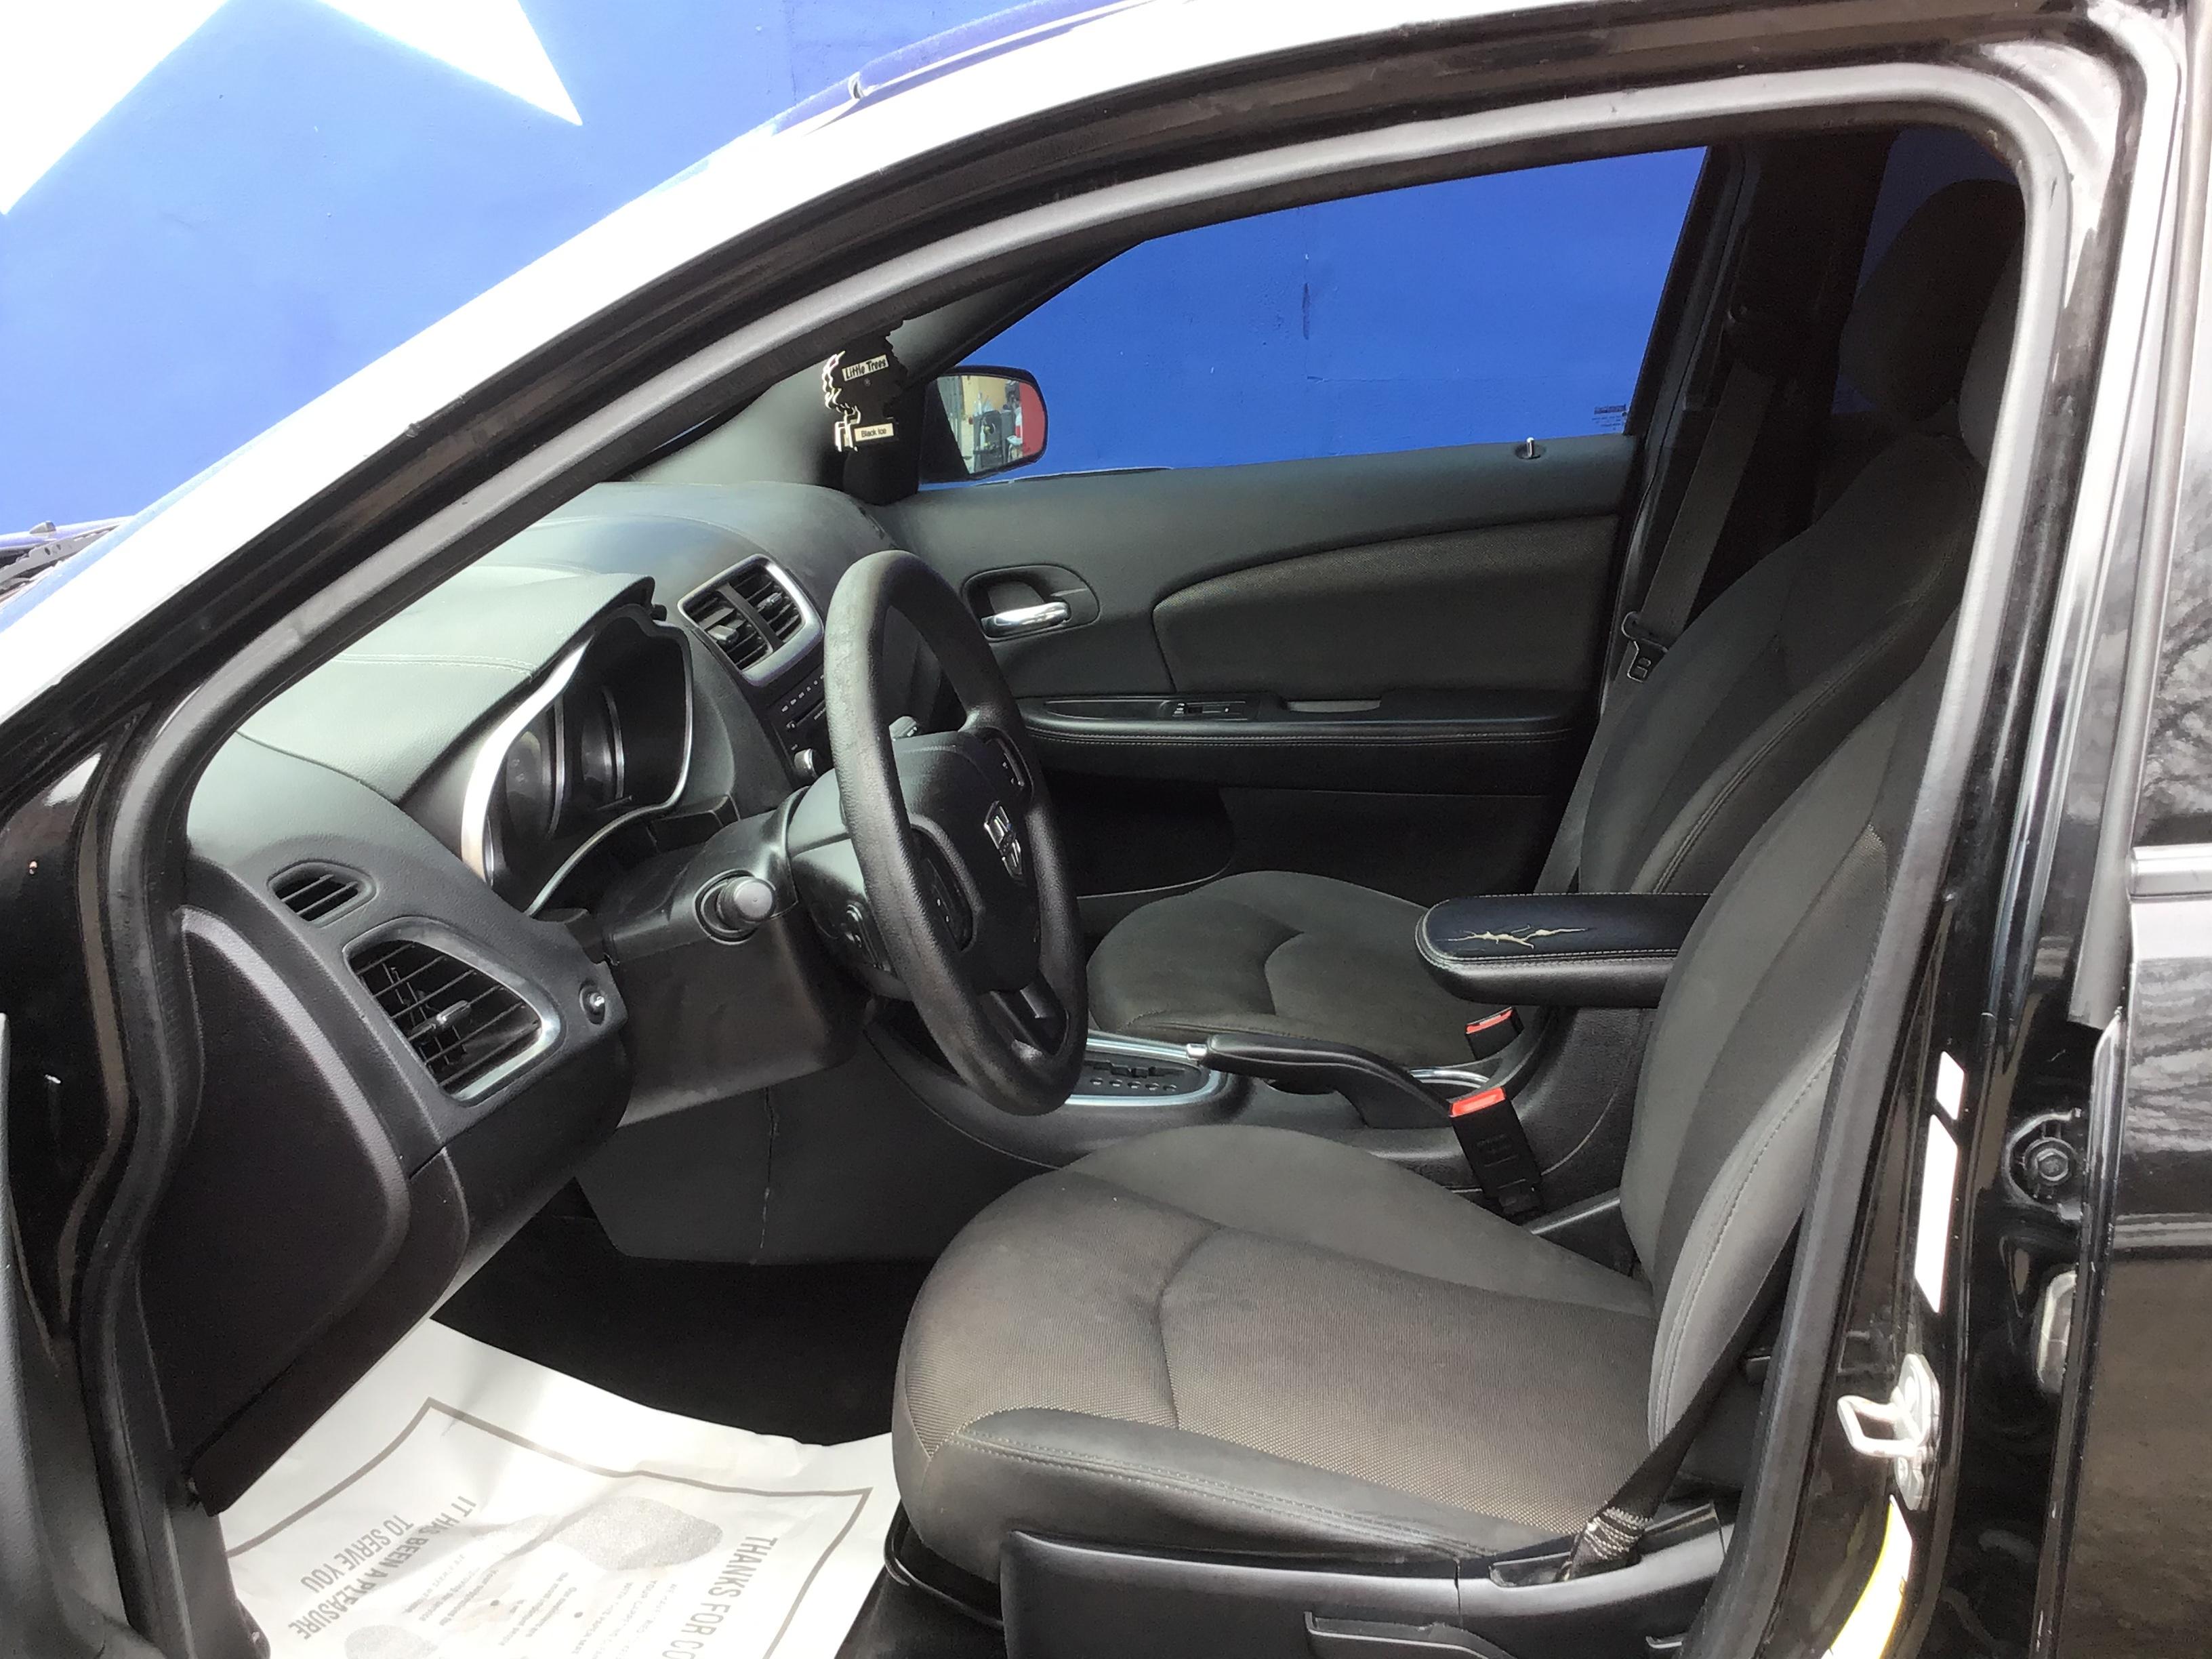 used vehicle - 4 DOOR SEDAN DODGE AVENGER 2014